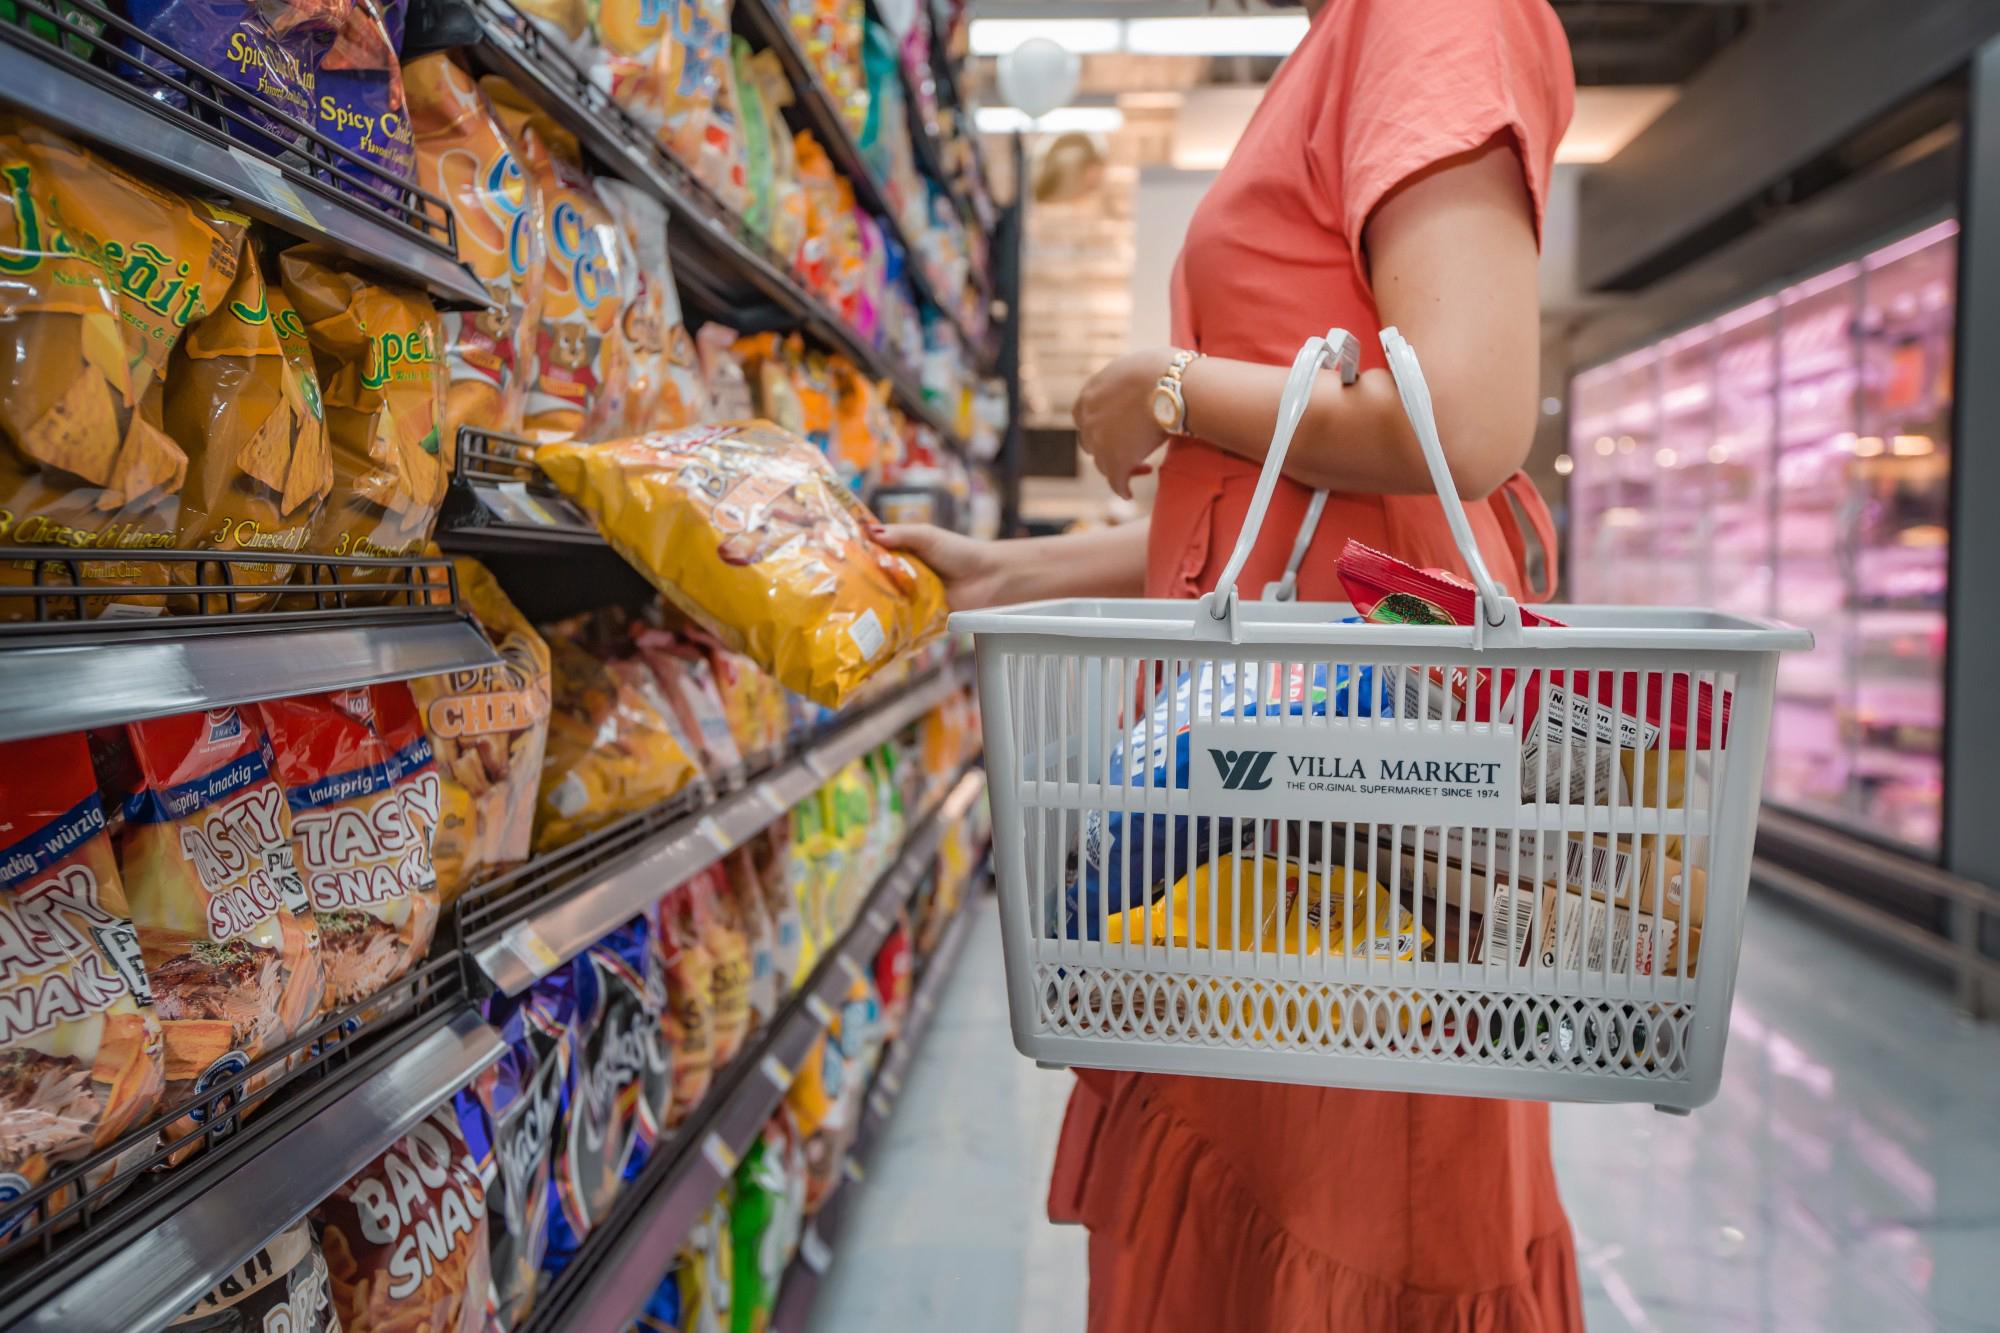 Villa Market Supermarkets Dominate Import Food Scene in Thailand